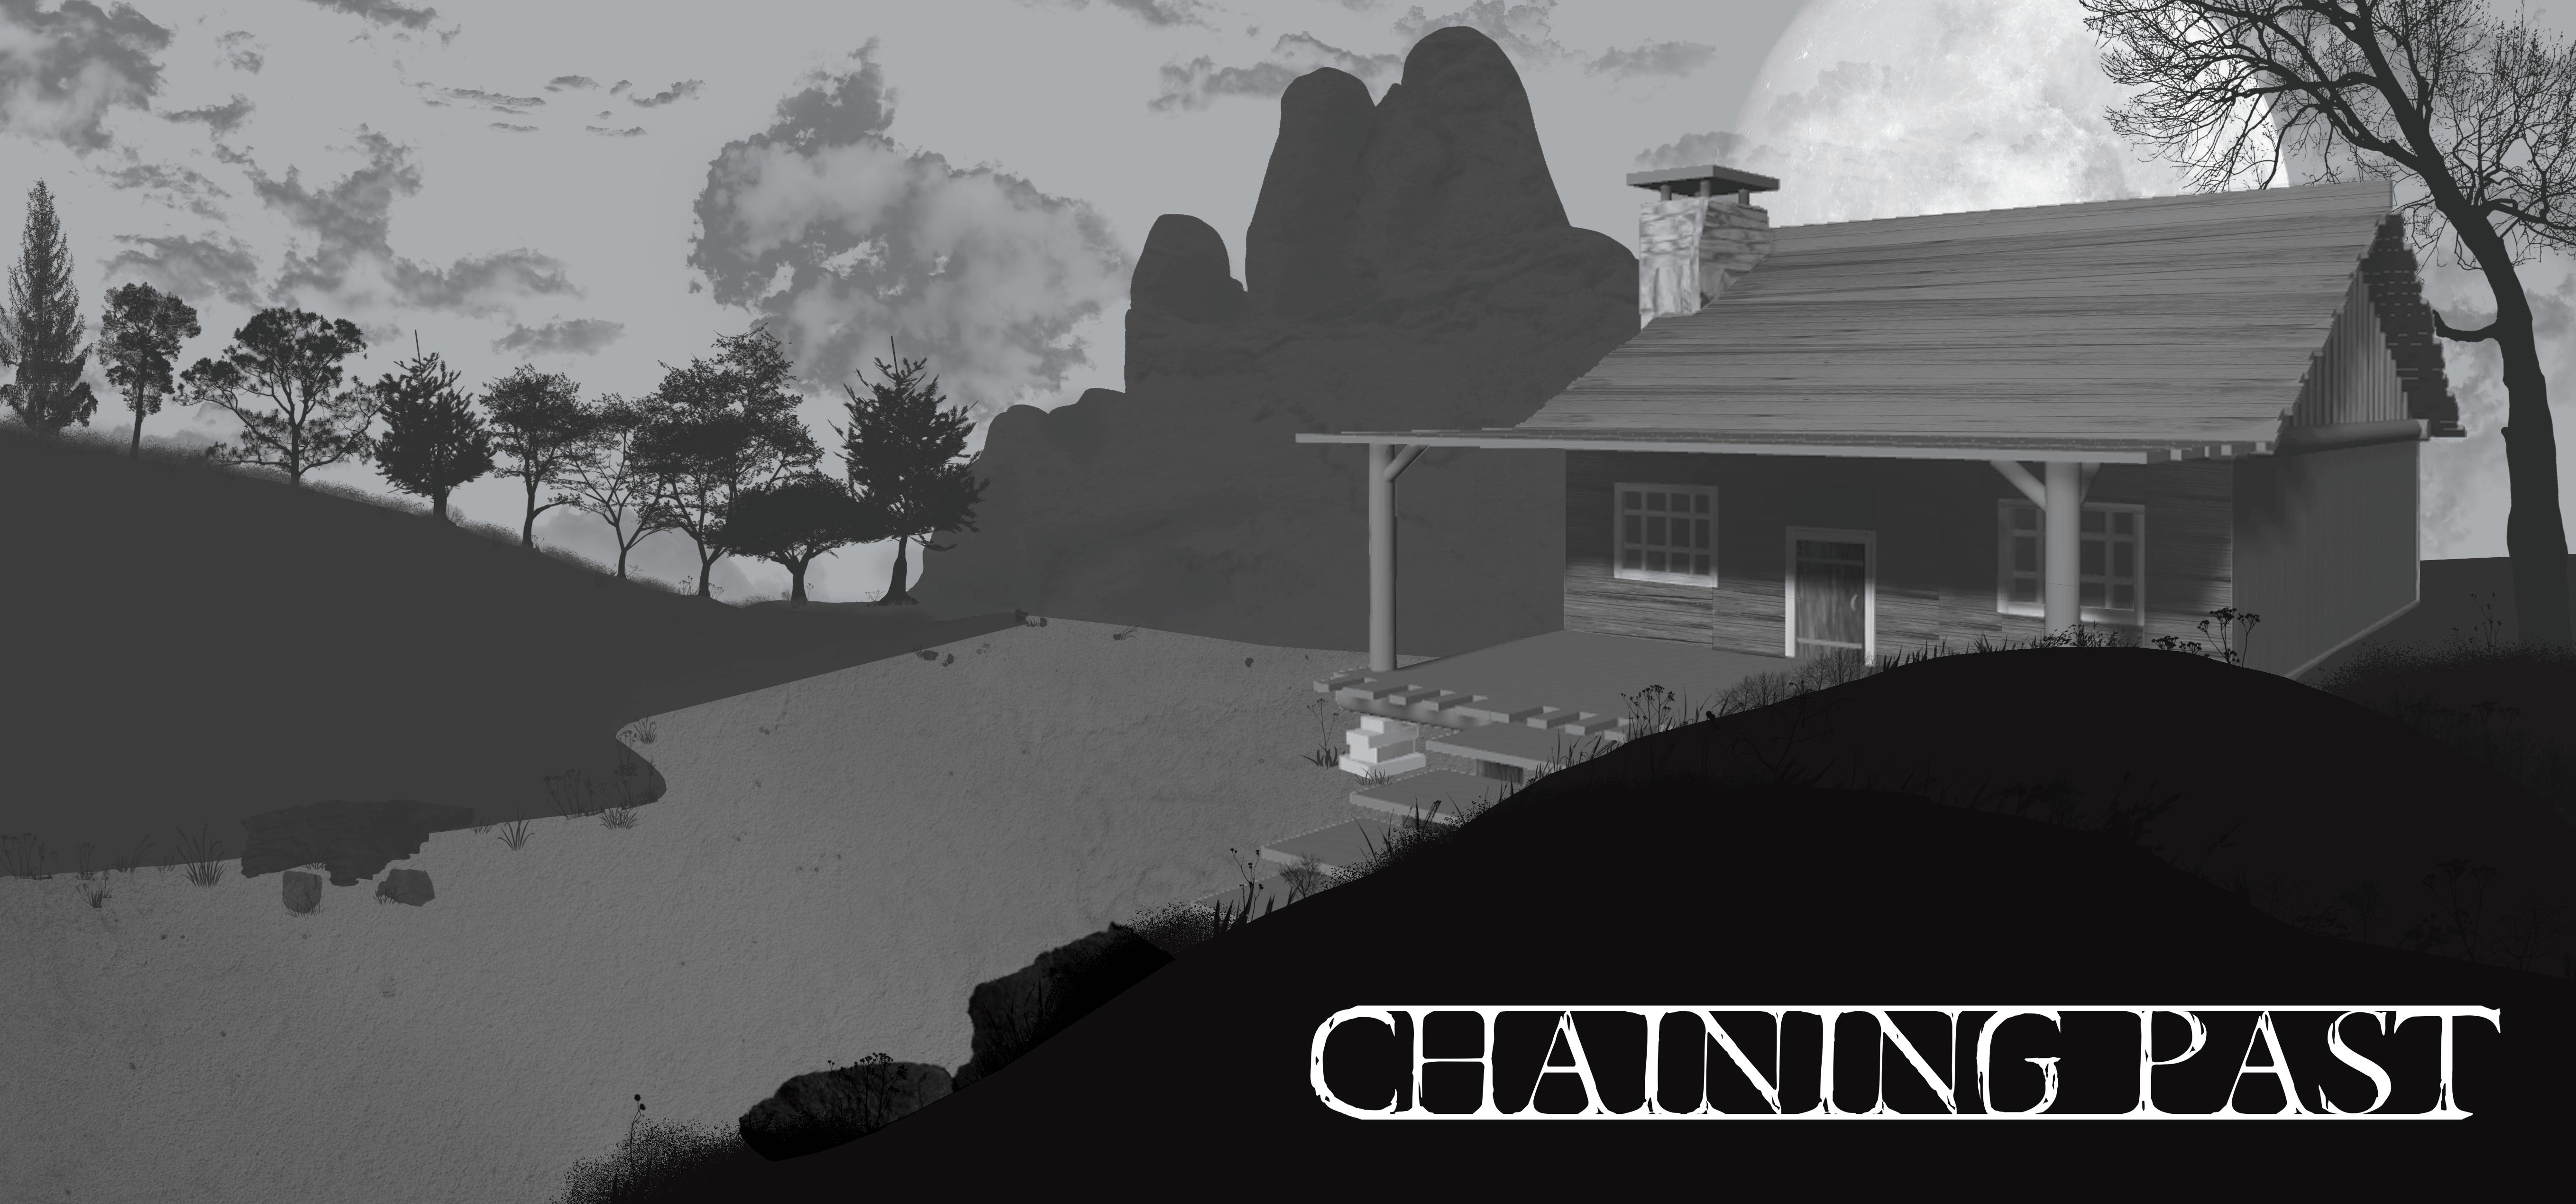 Chaining Past